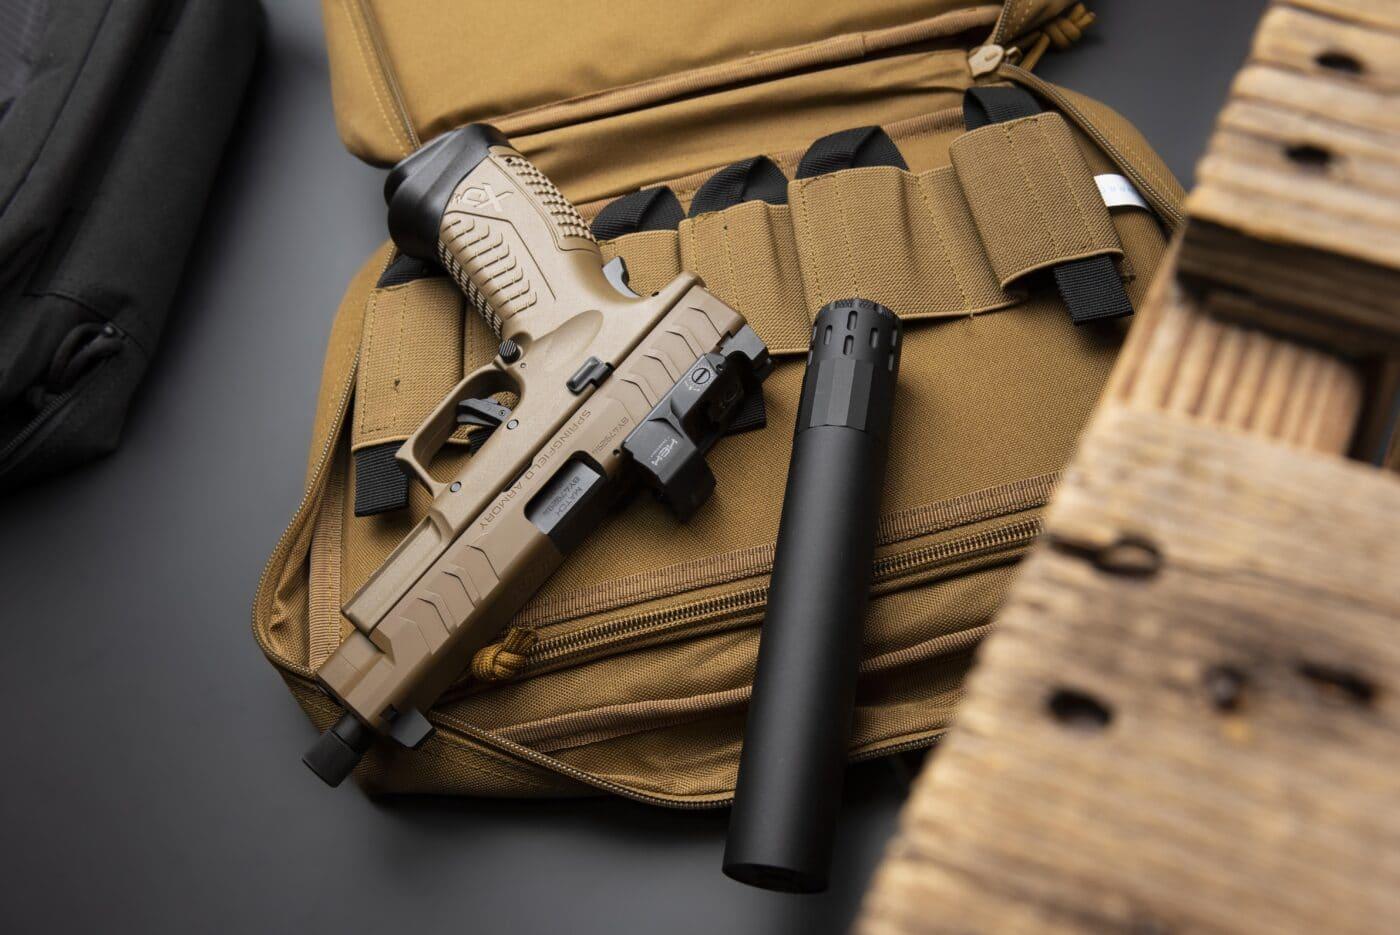 Multi-caliber suppressor sitting next to pistol